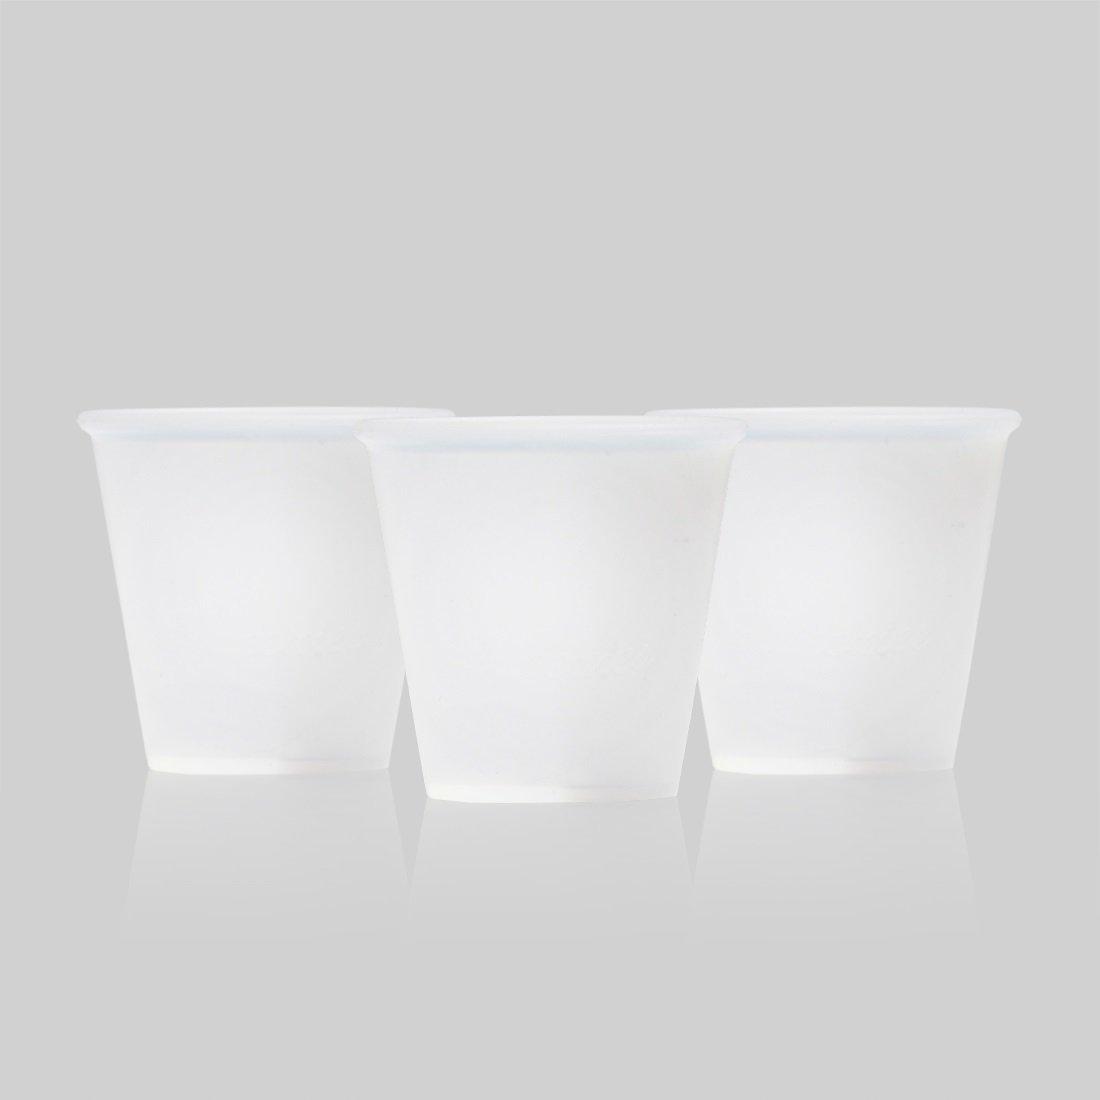 Silicone Bathroom Cups 4pk (3oz) Reusable, Eco-Friendly, Dishwasher Safe